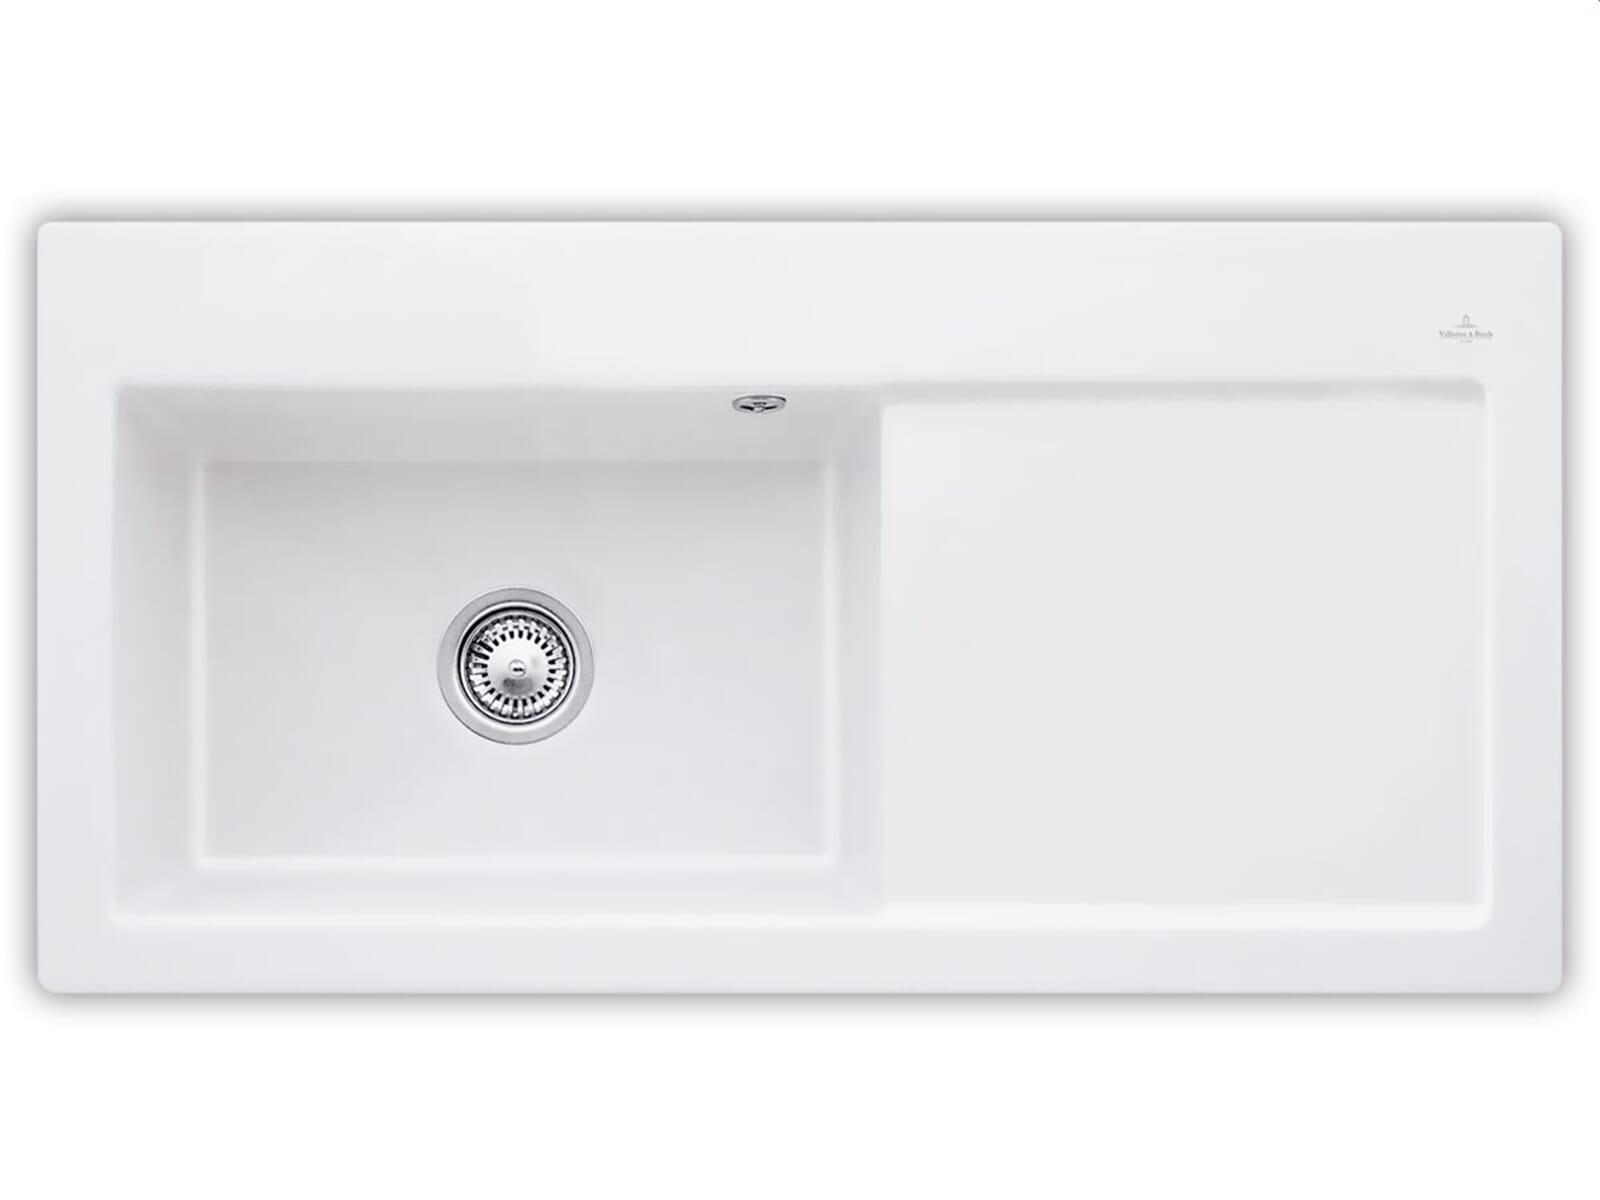 villeroy boch subway 60 xl edelweiss 6718 01 s3. Black Bedroom Furniture Sets. Home Design Ideas